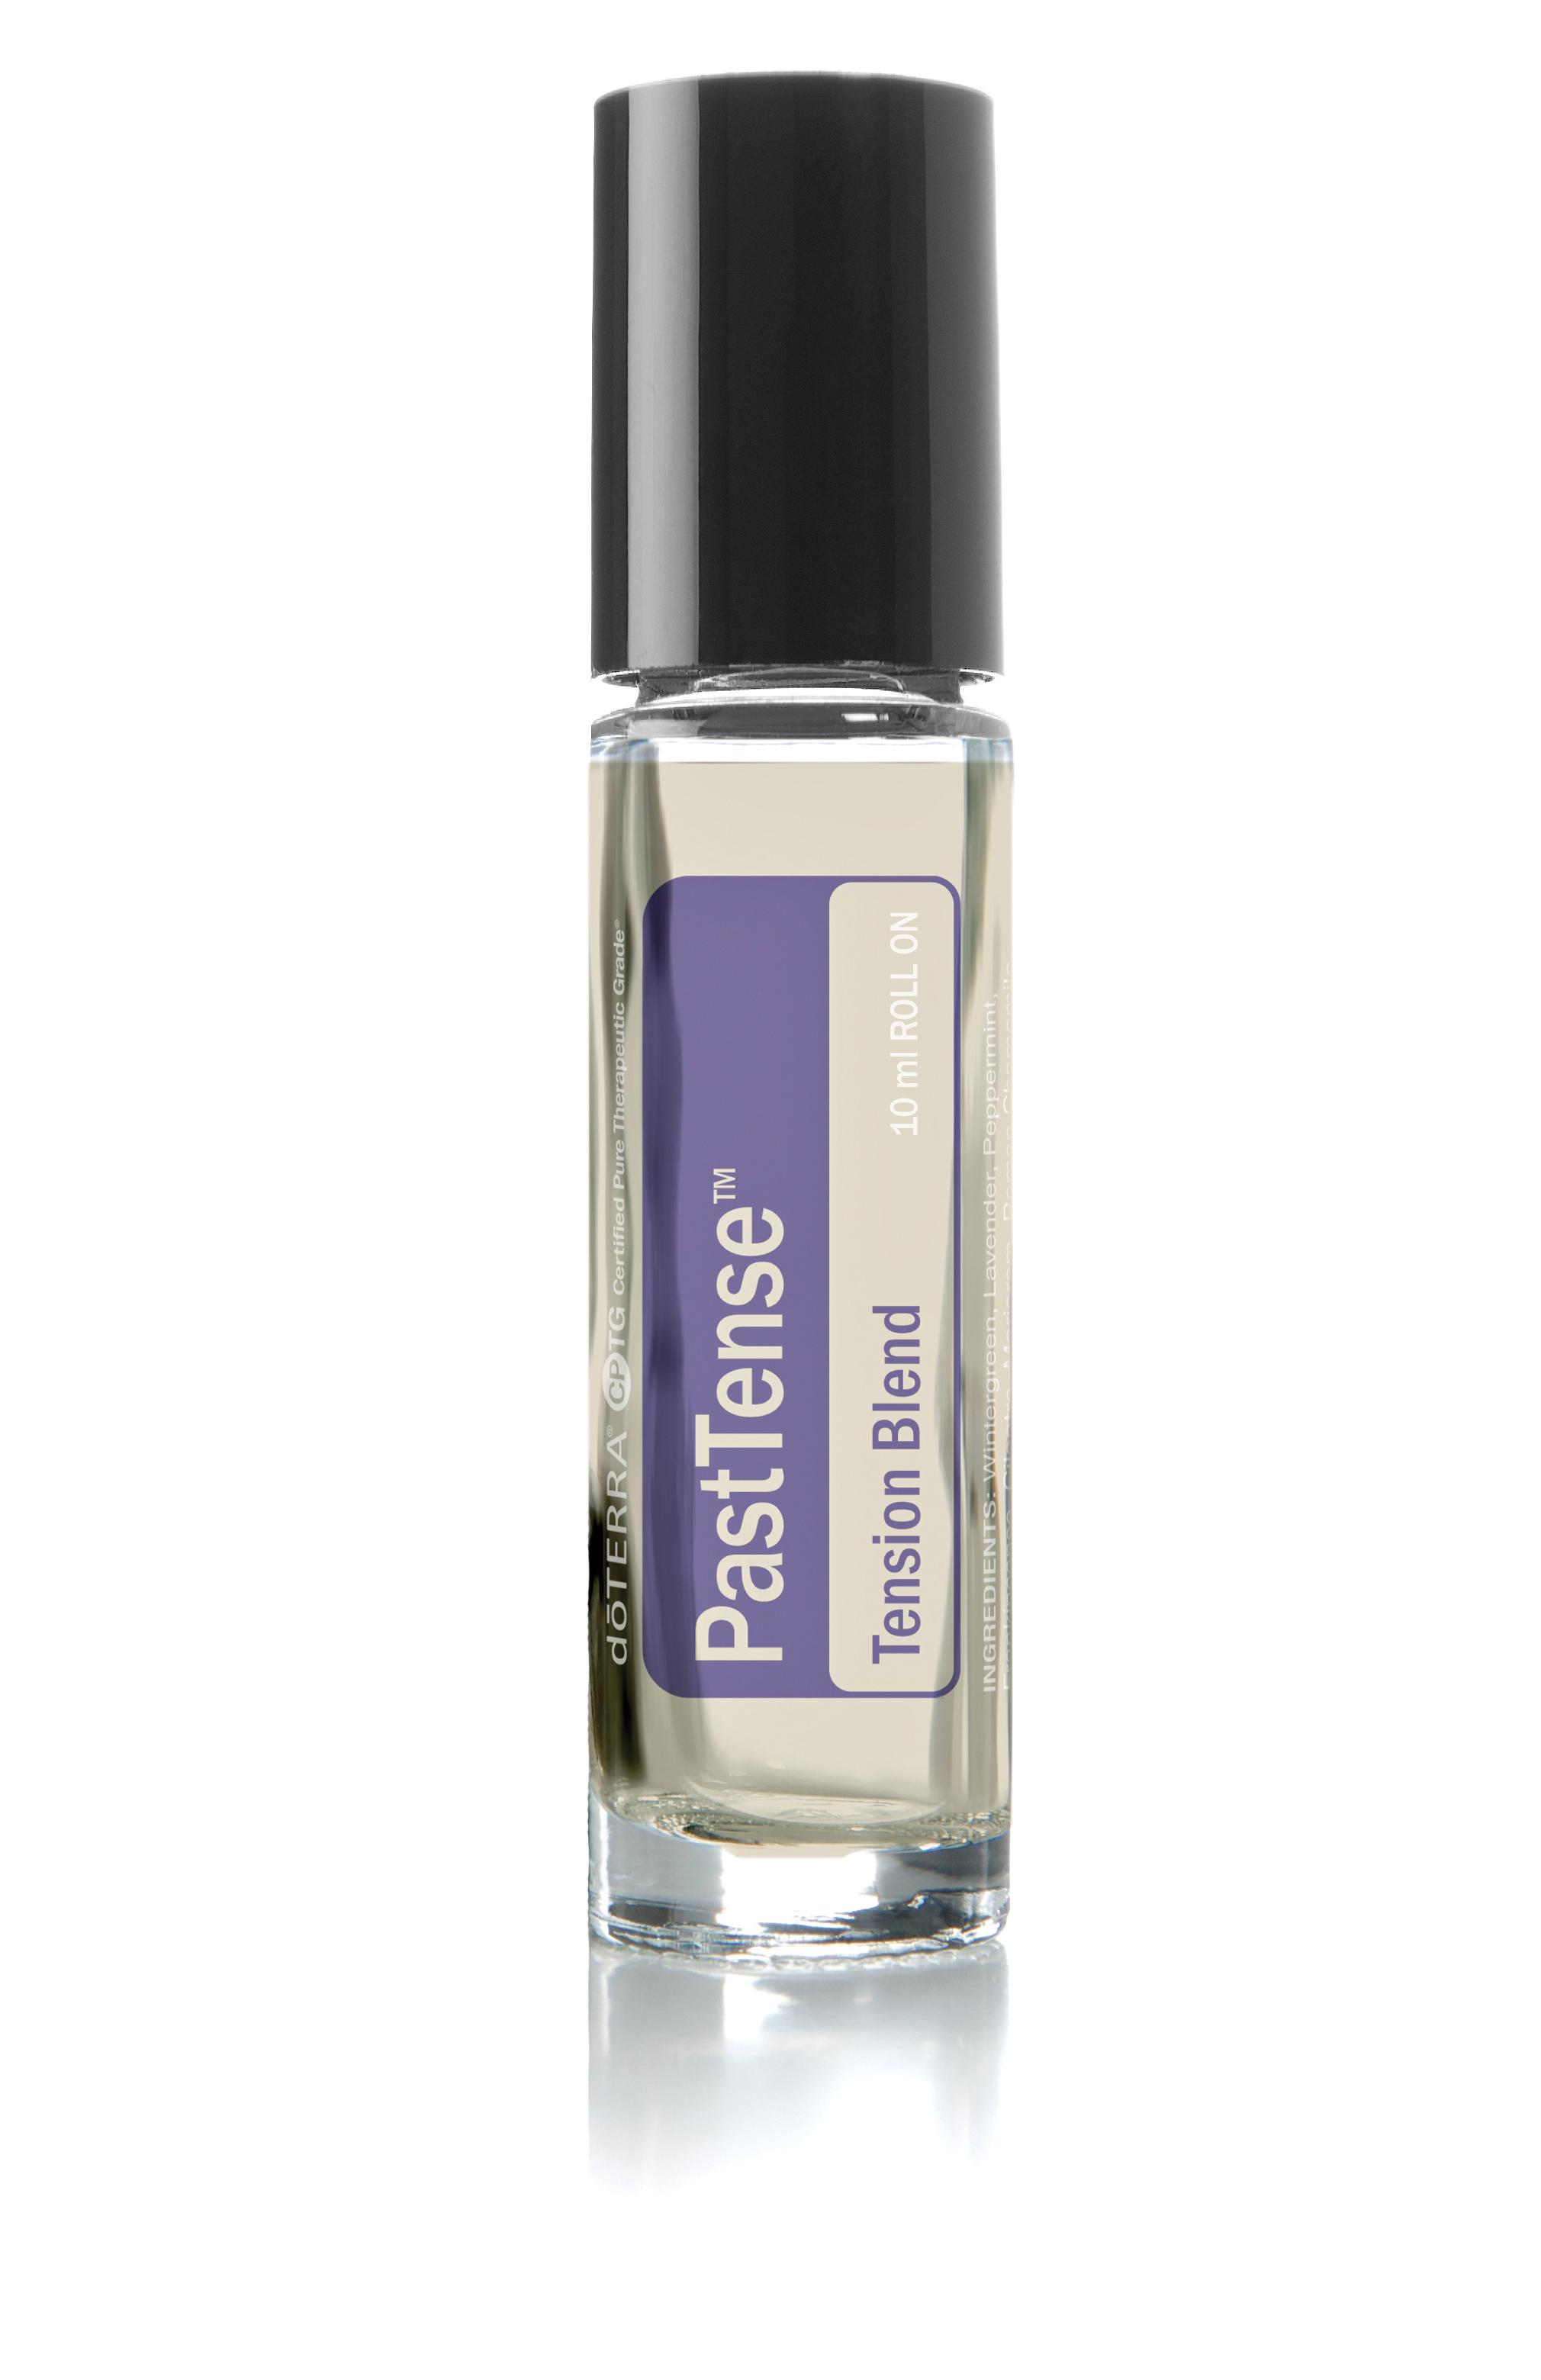 doTERRA PastTense Essential Oil Blend